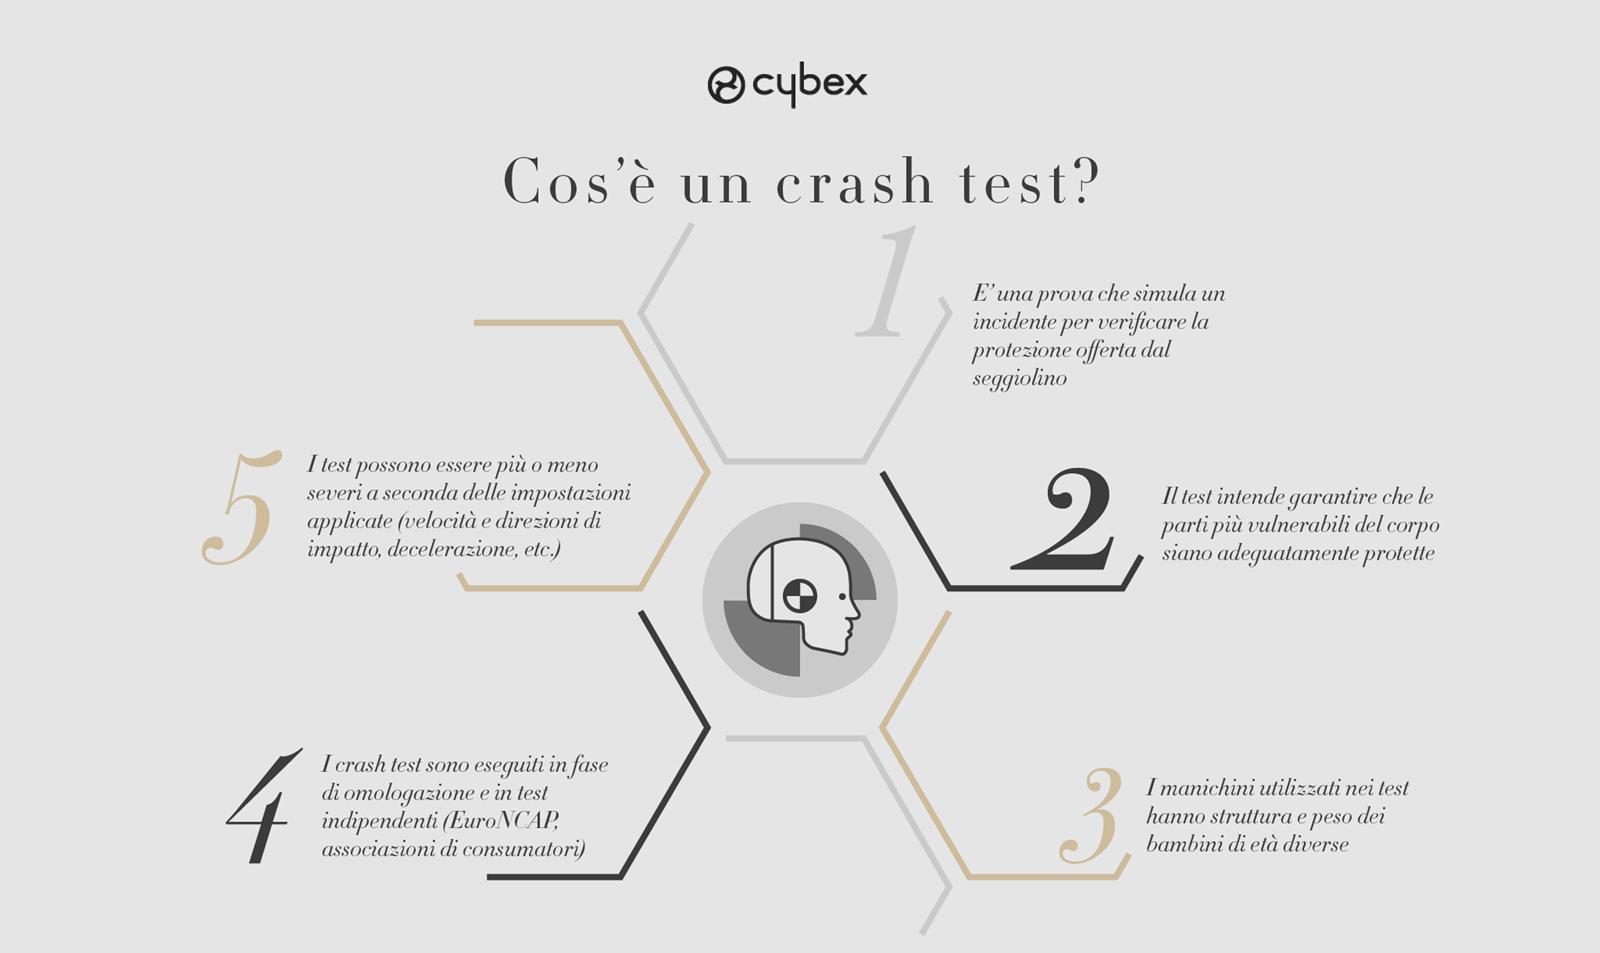 CYBEX_cosa è un crash test